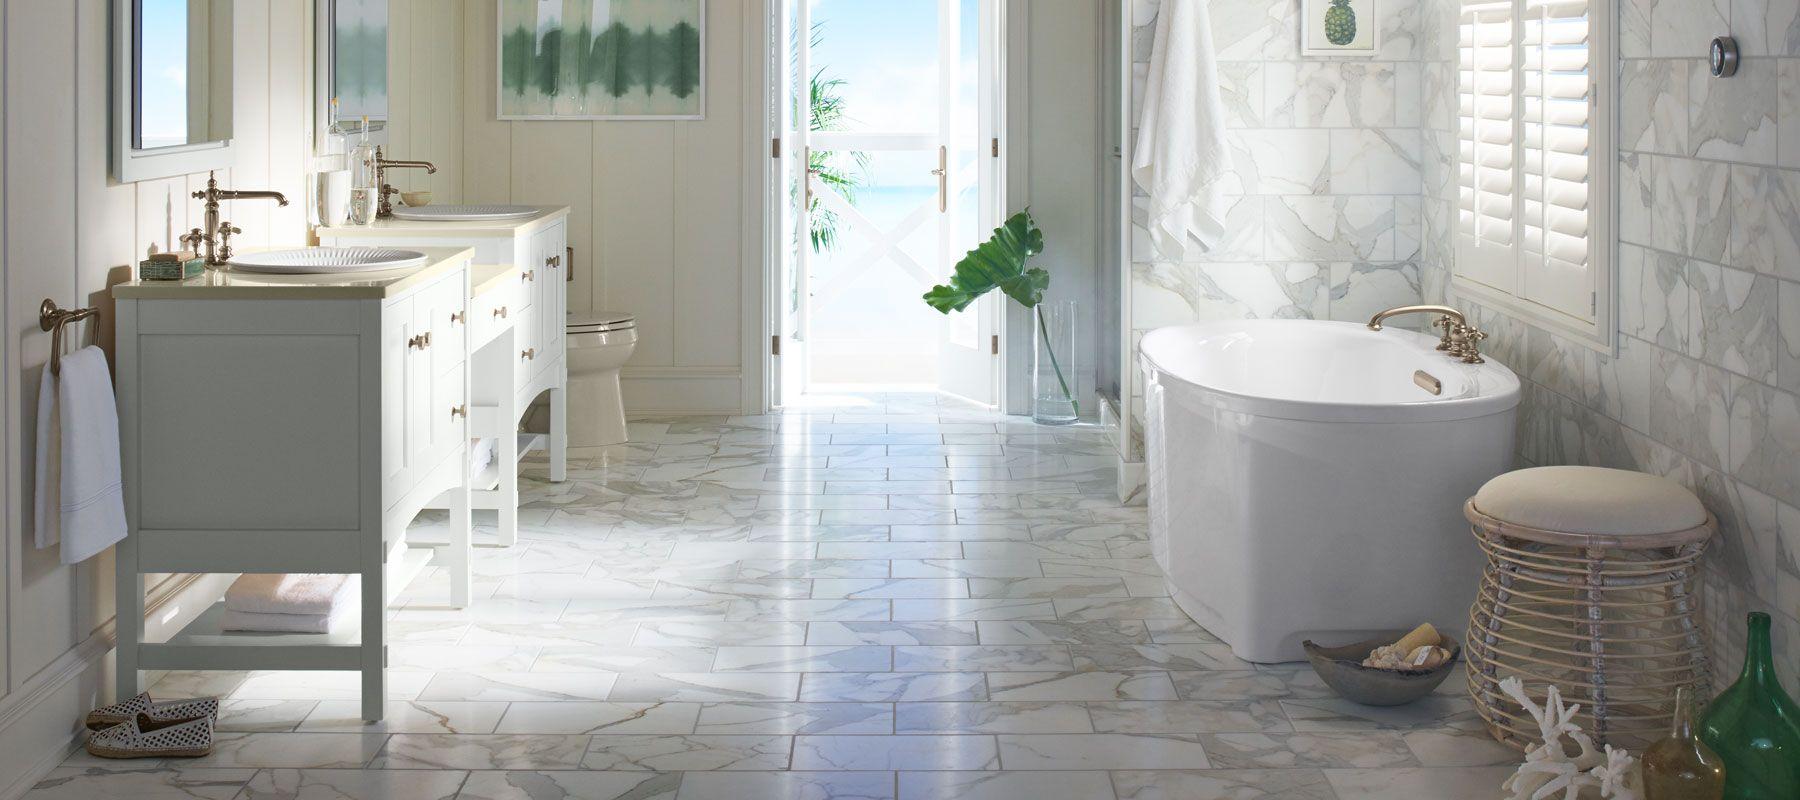 Best Kitchen Gallery: Floor Plan Options Bathroom Ideas Planning Bathroom Kohler of Kohler Bathrooms Designs  on rachelxblog.com